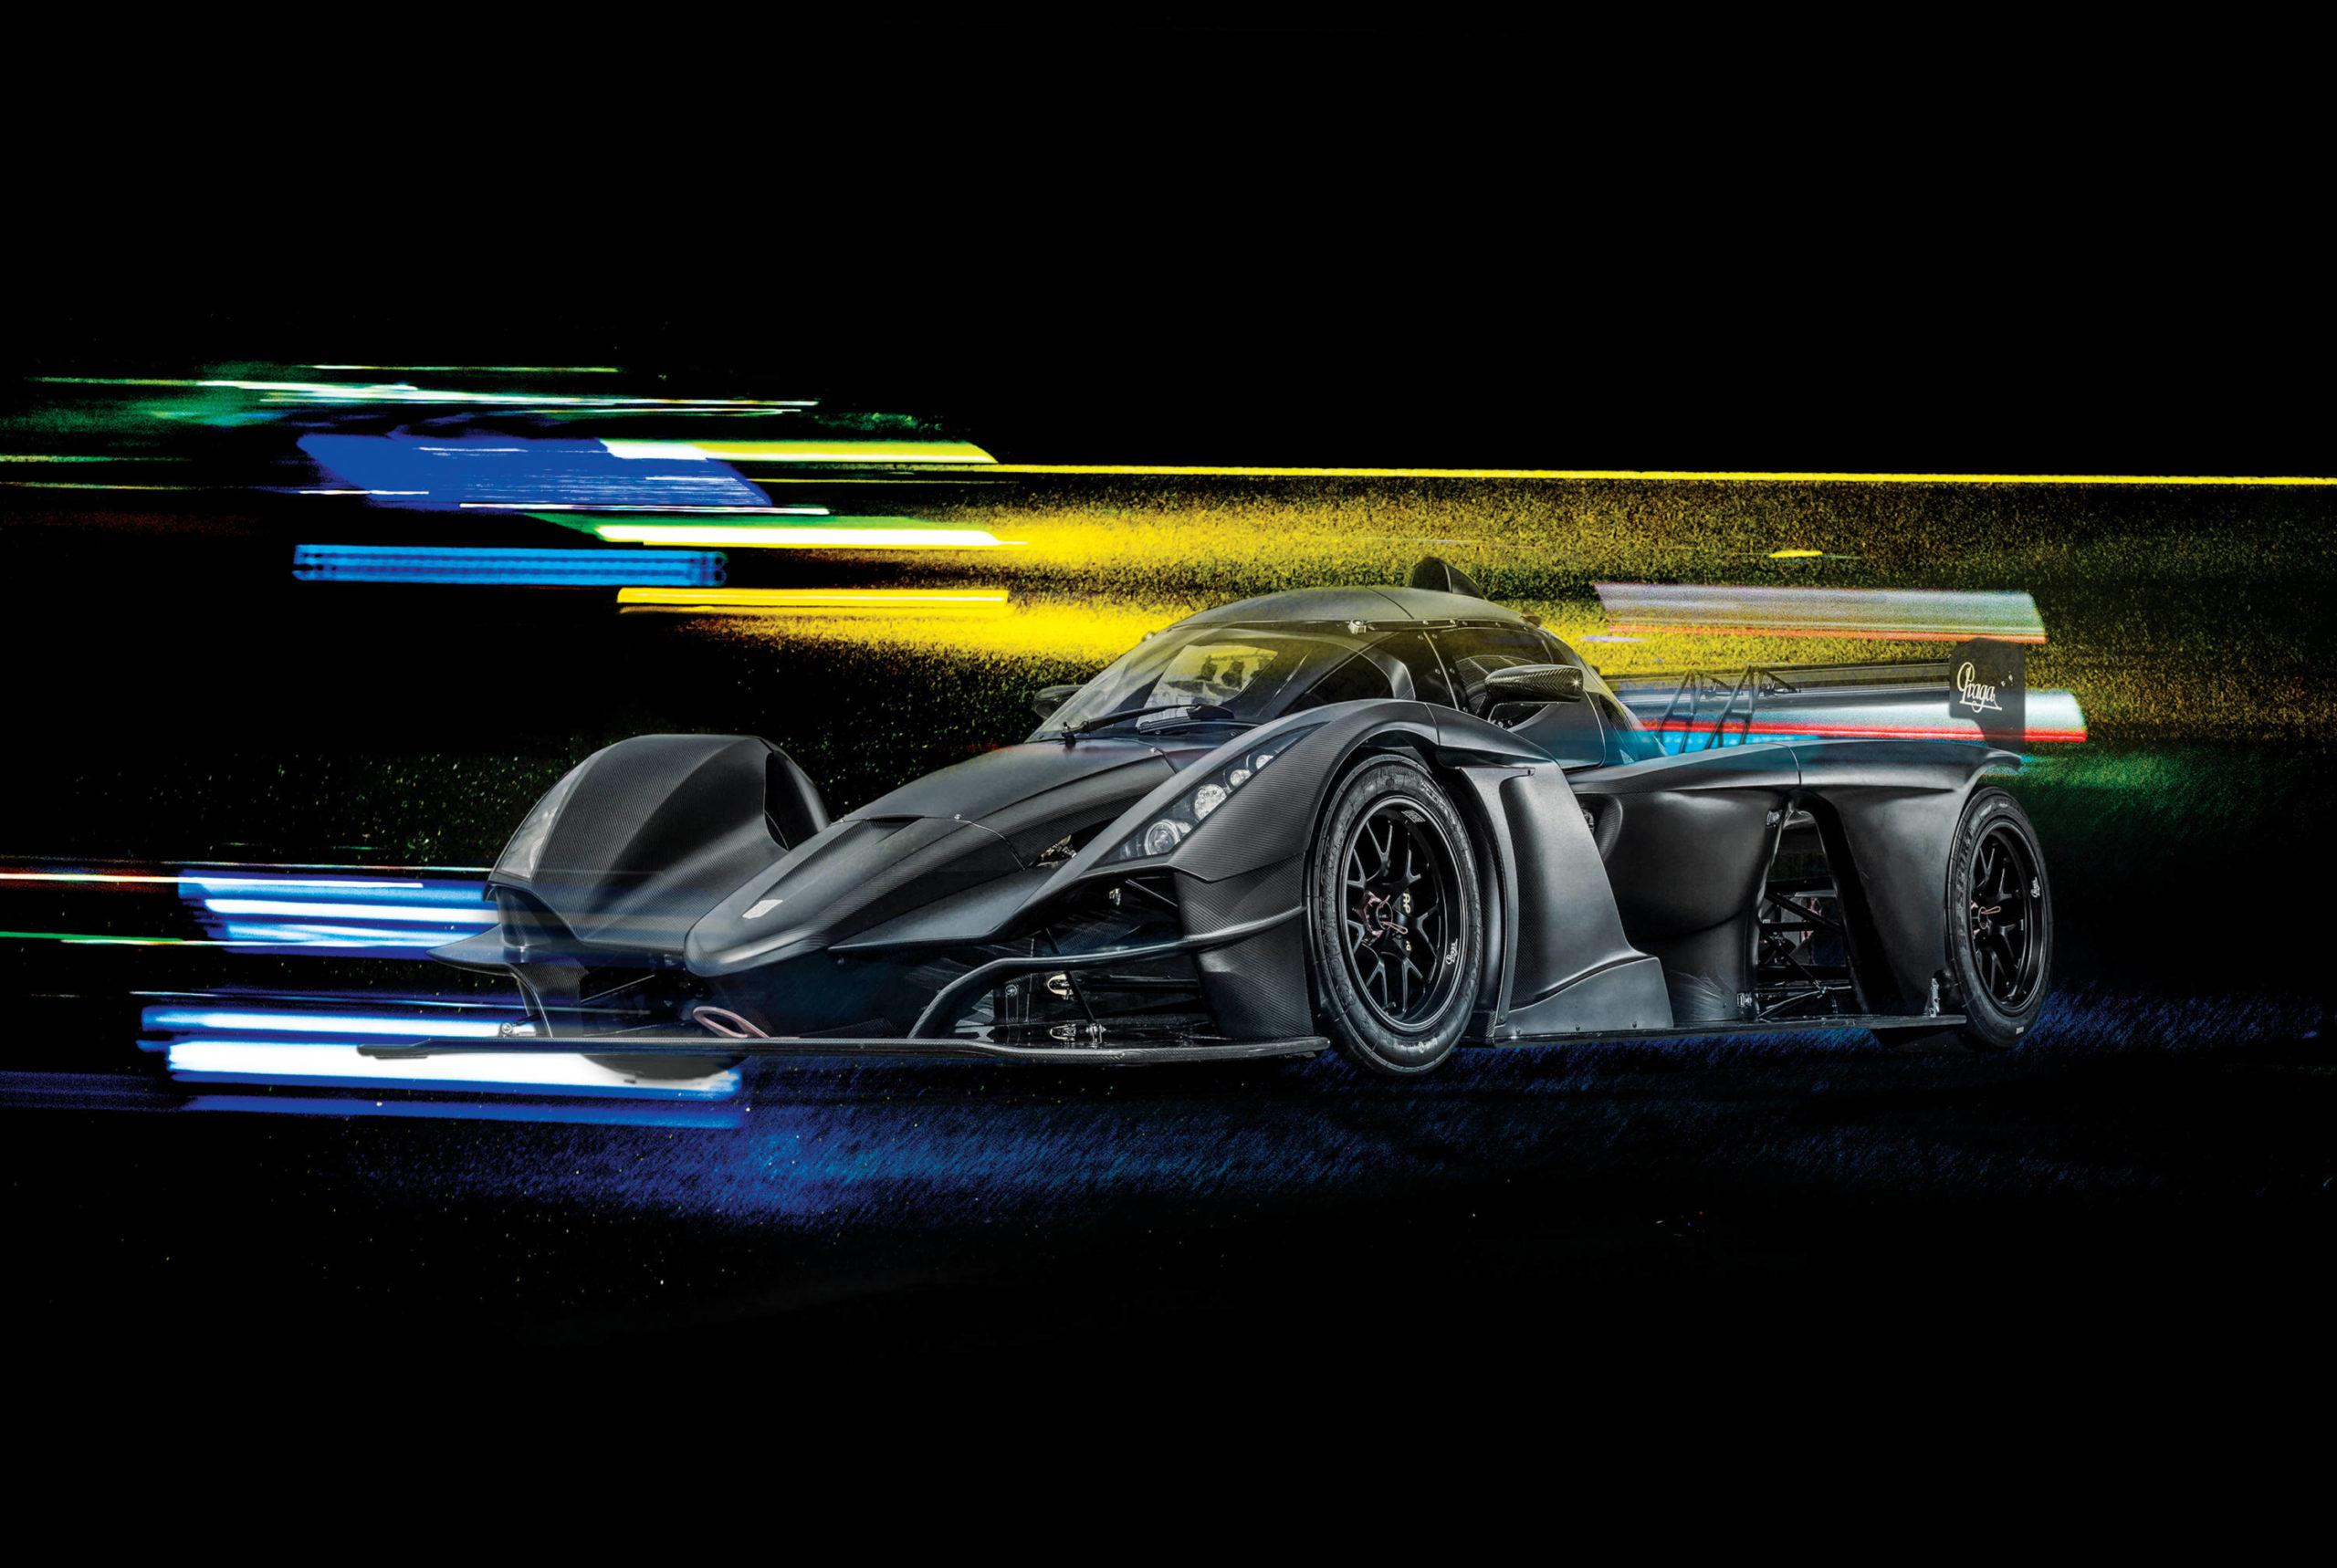 Praga is introducing a new Endurance Racing Series